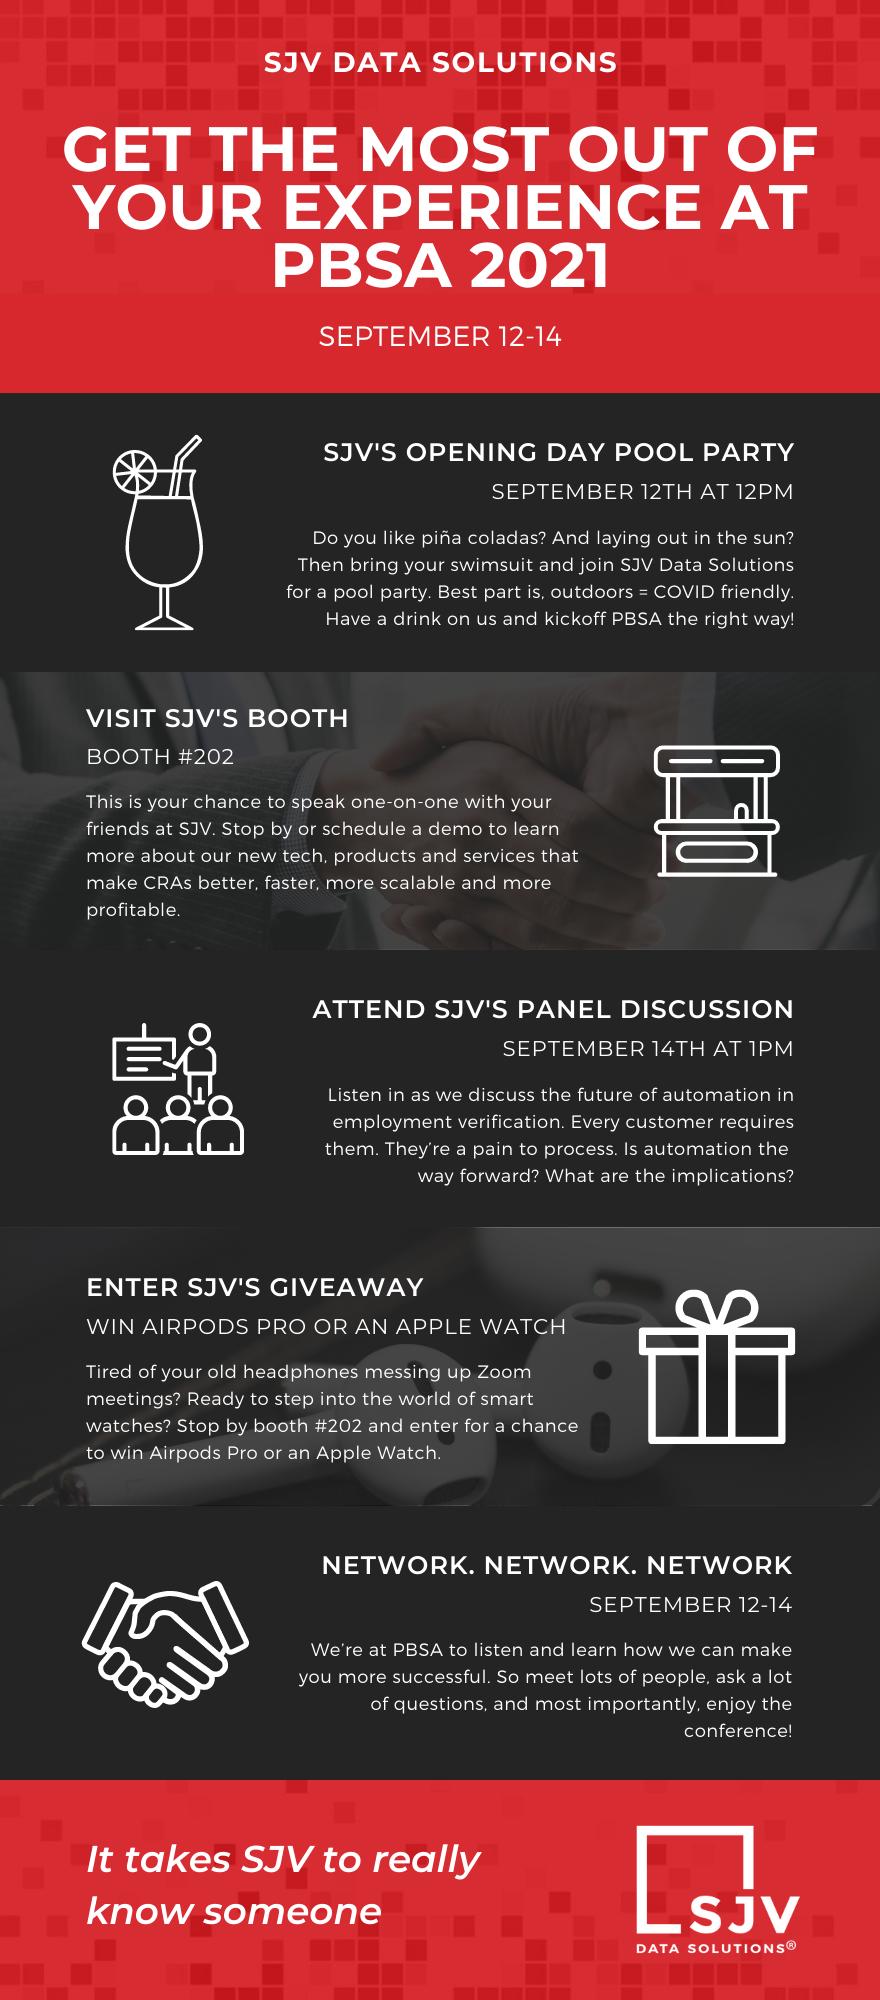 PBSA_Infographic_2 (2)